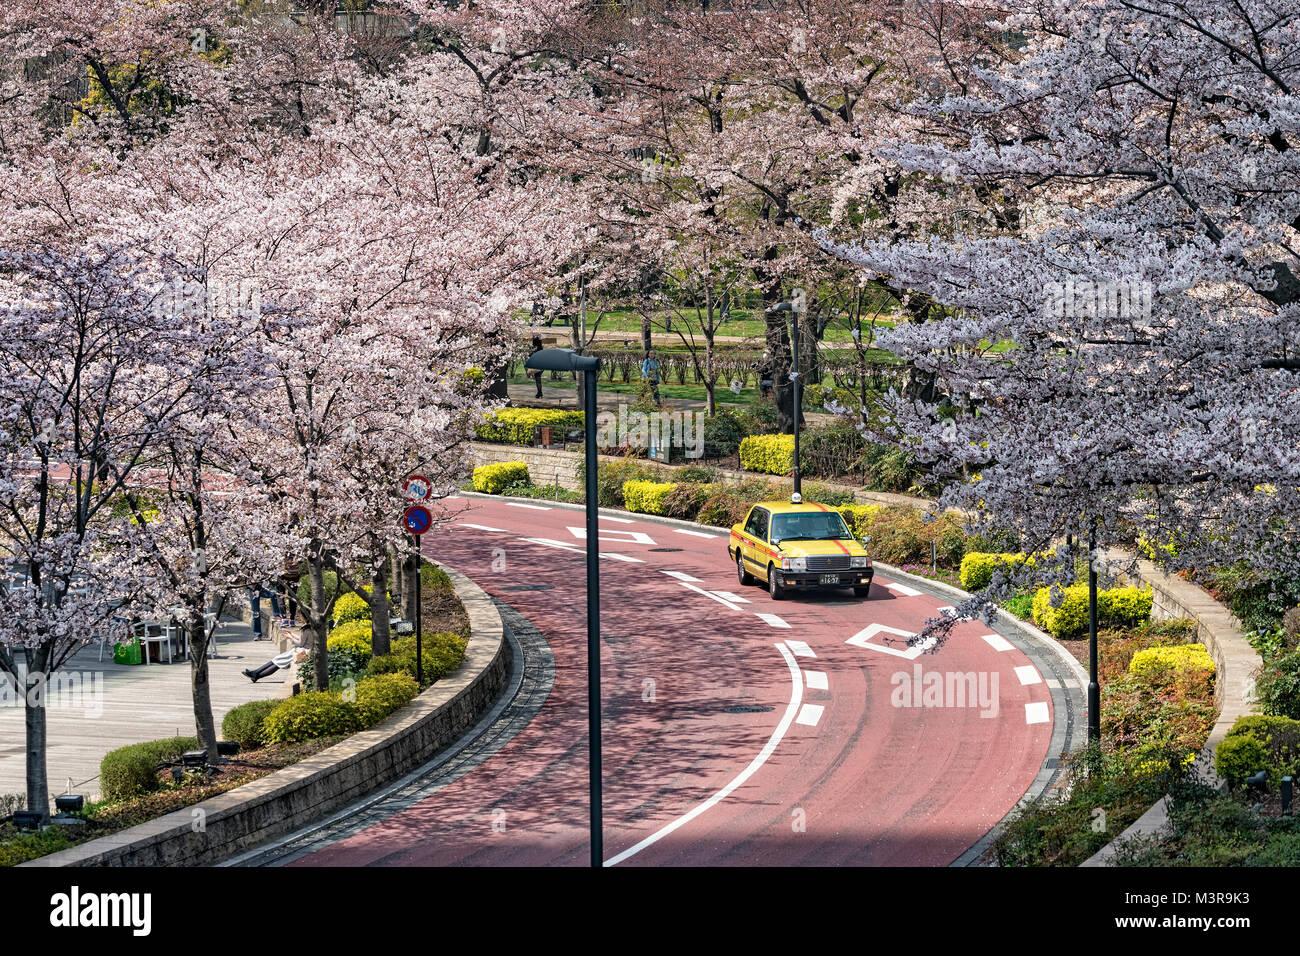 Japan, Honshu island, Kanto, Tokyo, the Midtown Roppongi district in spring. - Stock Image